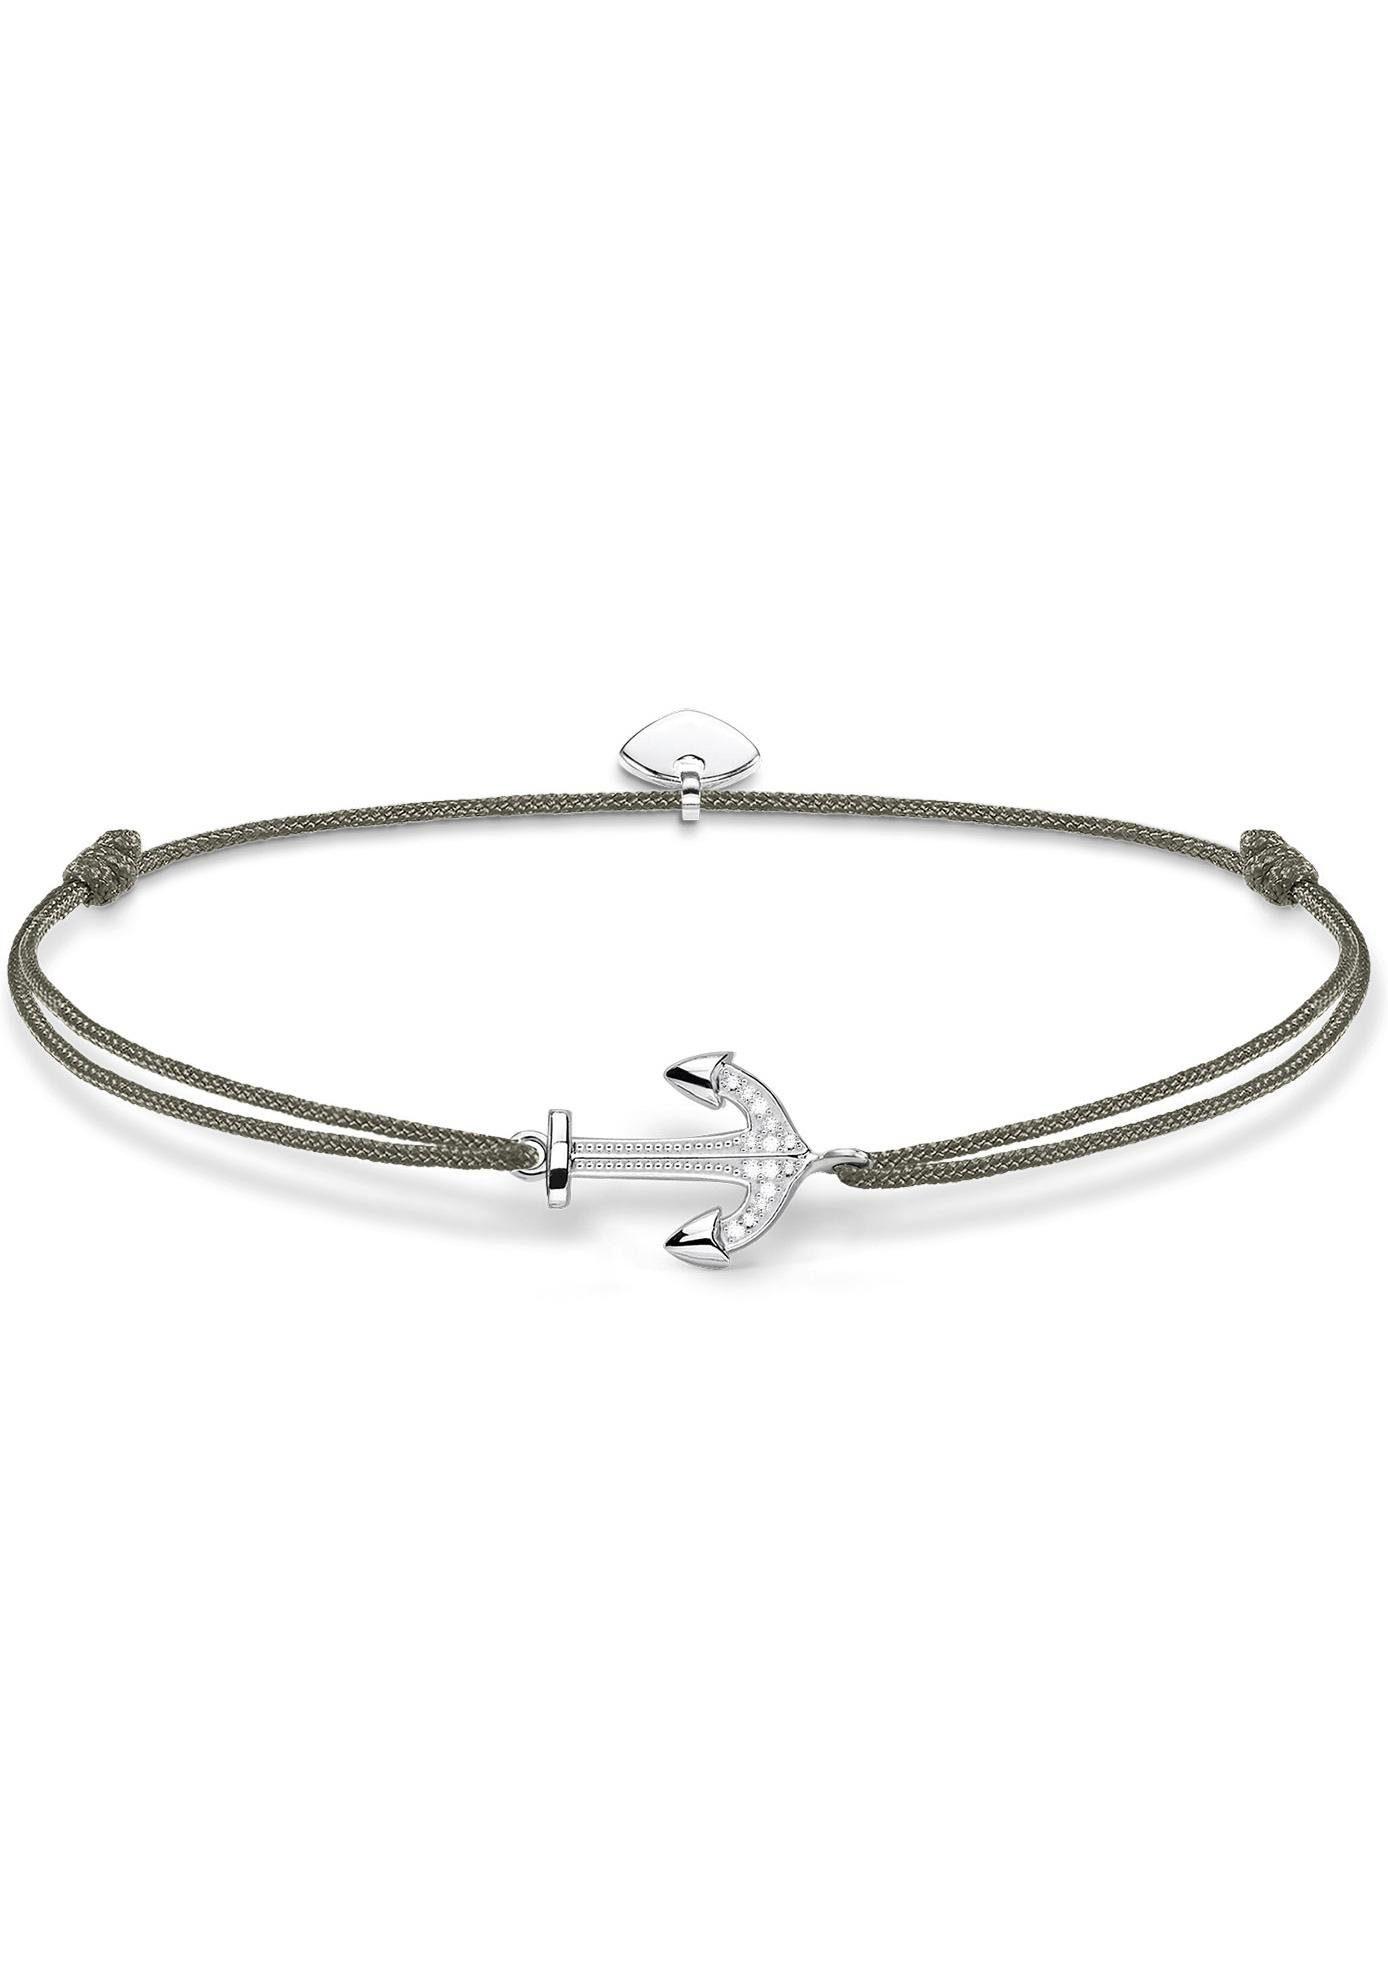 THOMAS SABO Armband »Little Secret Anker, LS053-401-5-L20v« mit Zirkonia